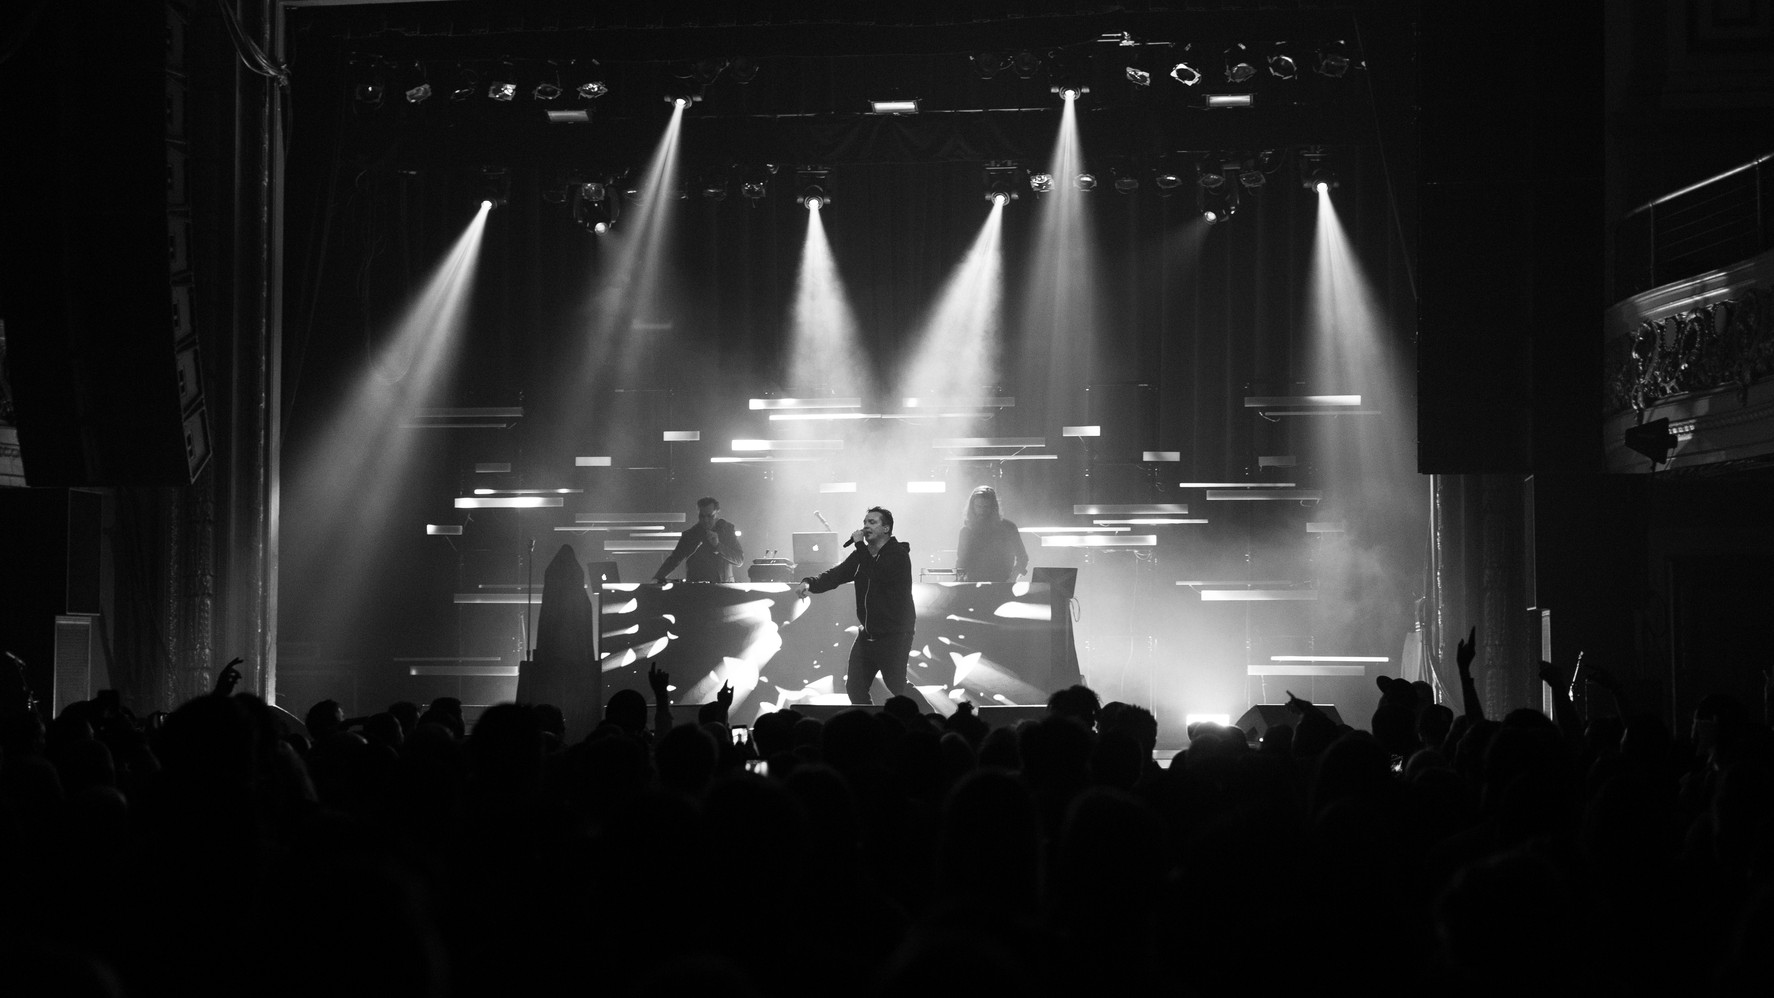 2.11.2020 Atmosphere | Regency Ballroom, SF, CA | Photographer: Brandon Crocker - Goldenvoice